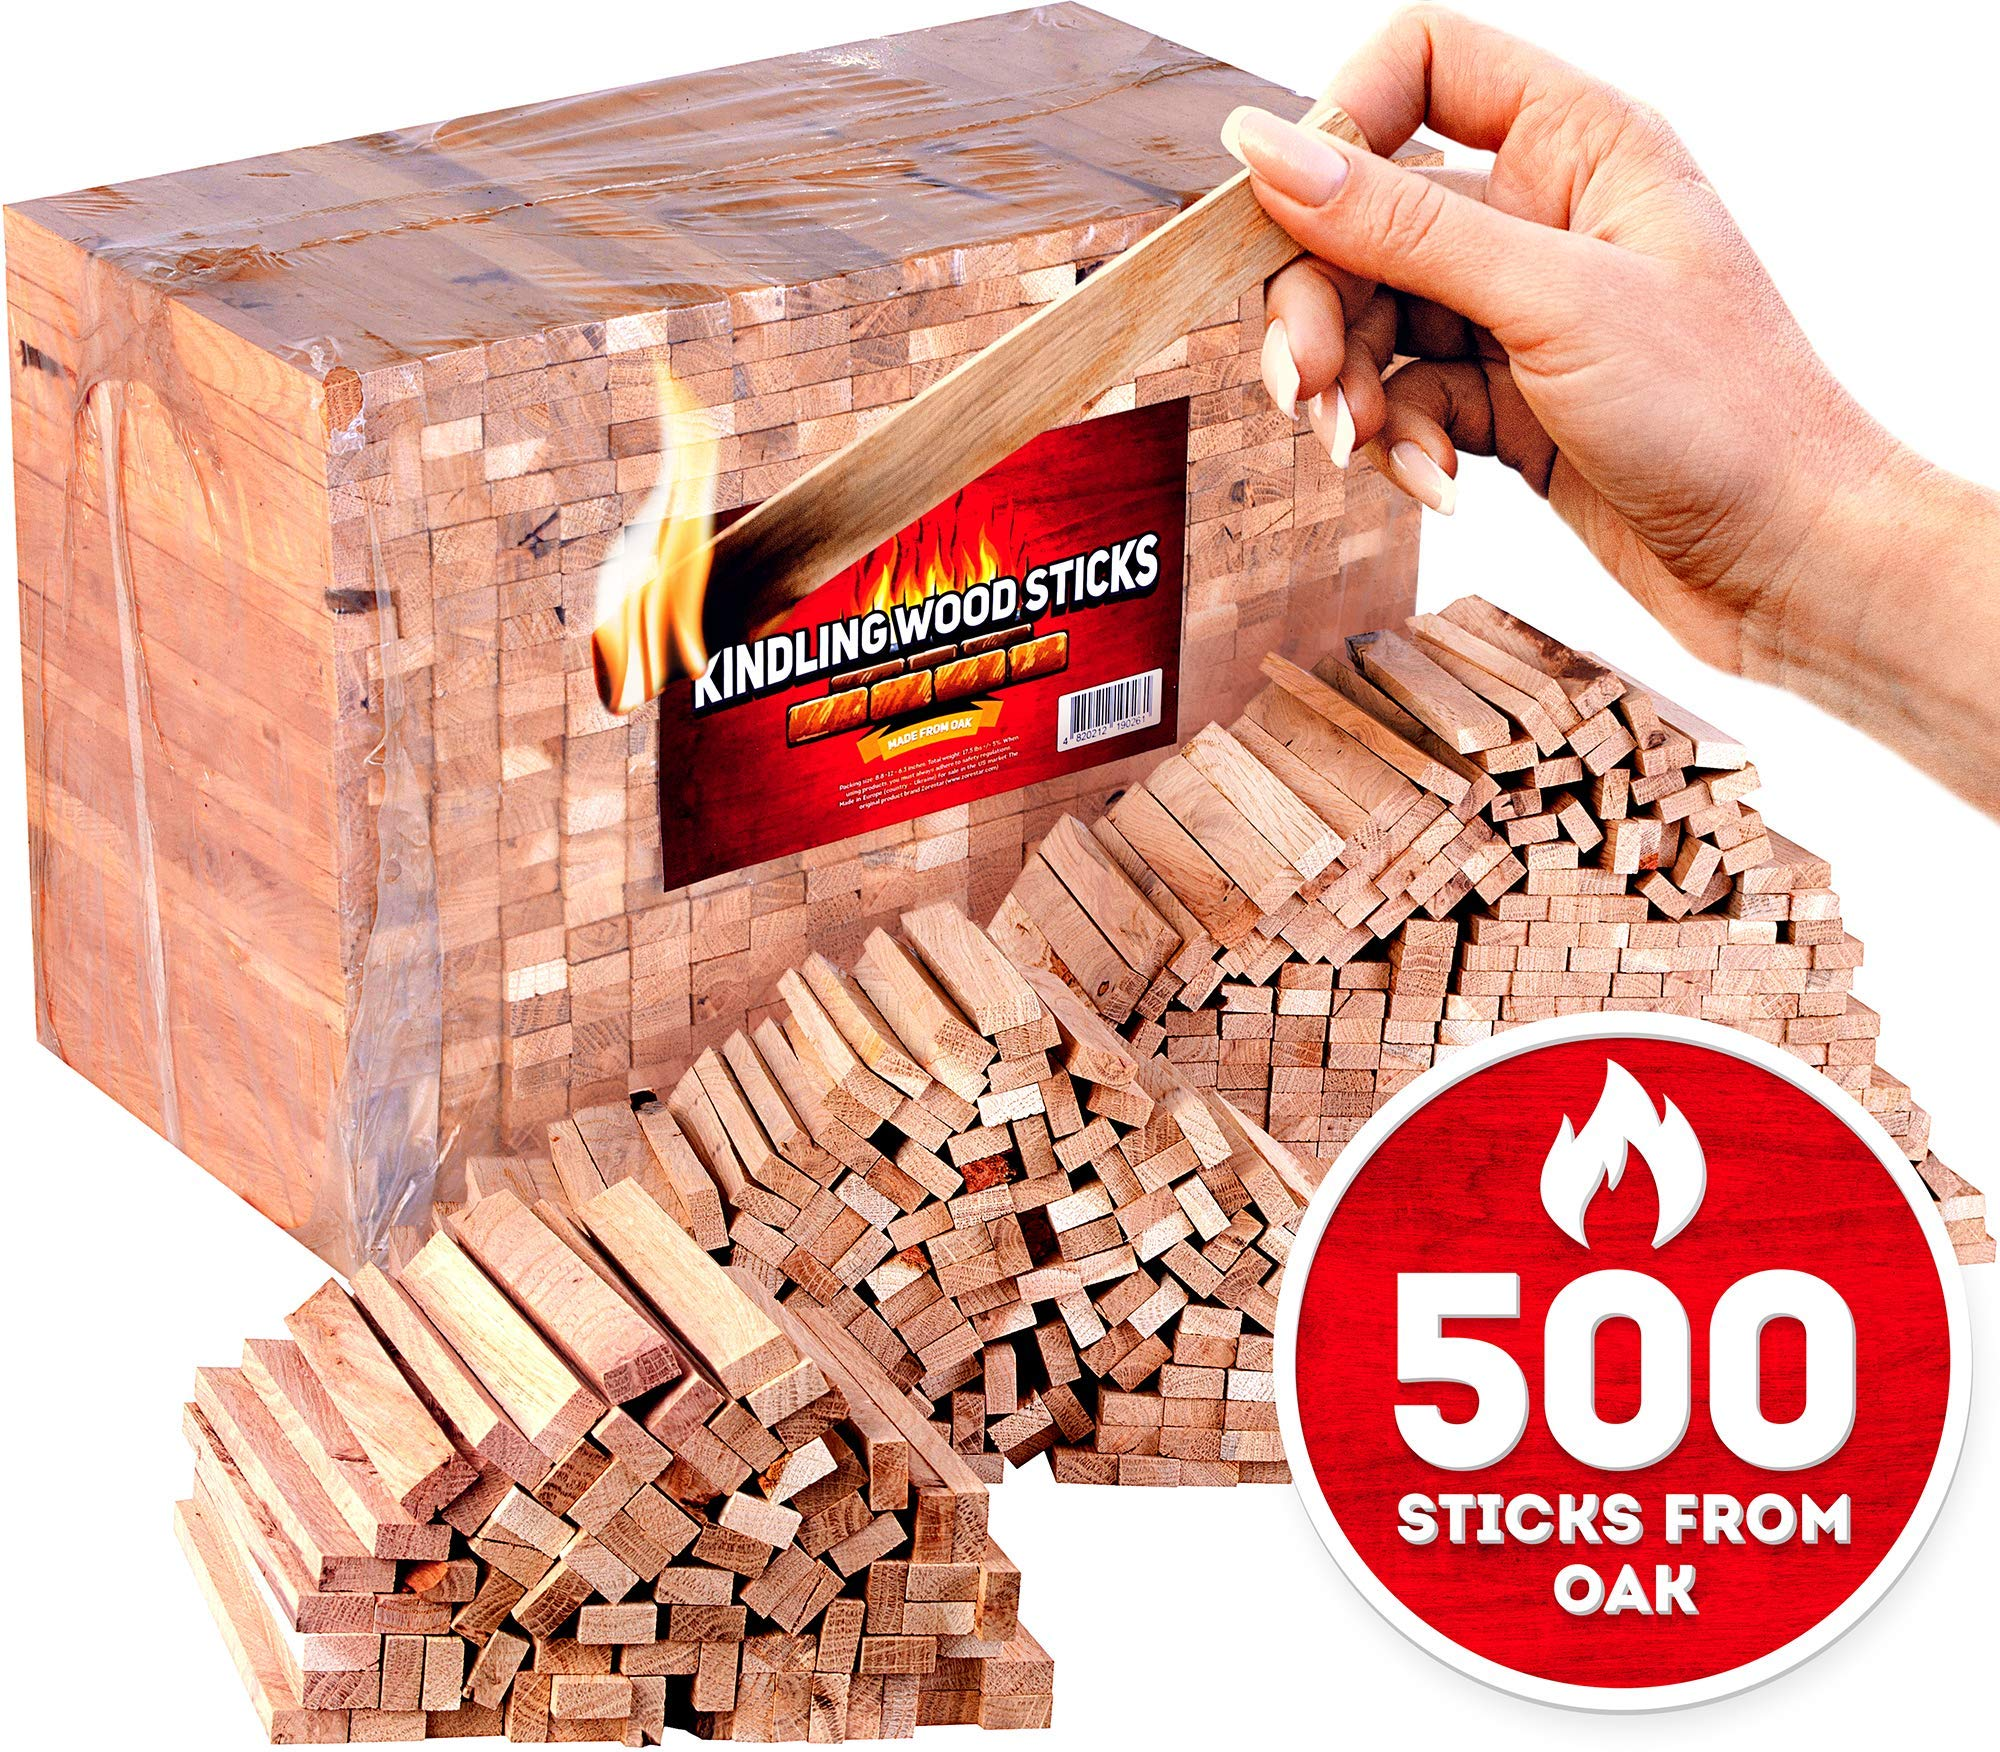 Kindling wood sticks 500pc - Fire starter sticks for campfires / fireplace / bbq / wood stove - Natural firestarters from 100% oak better than fatwood fire starters by Zorestar